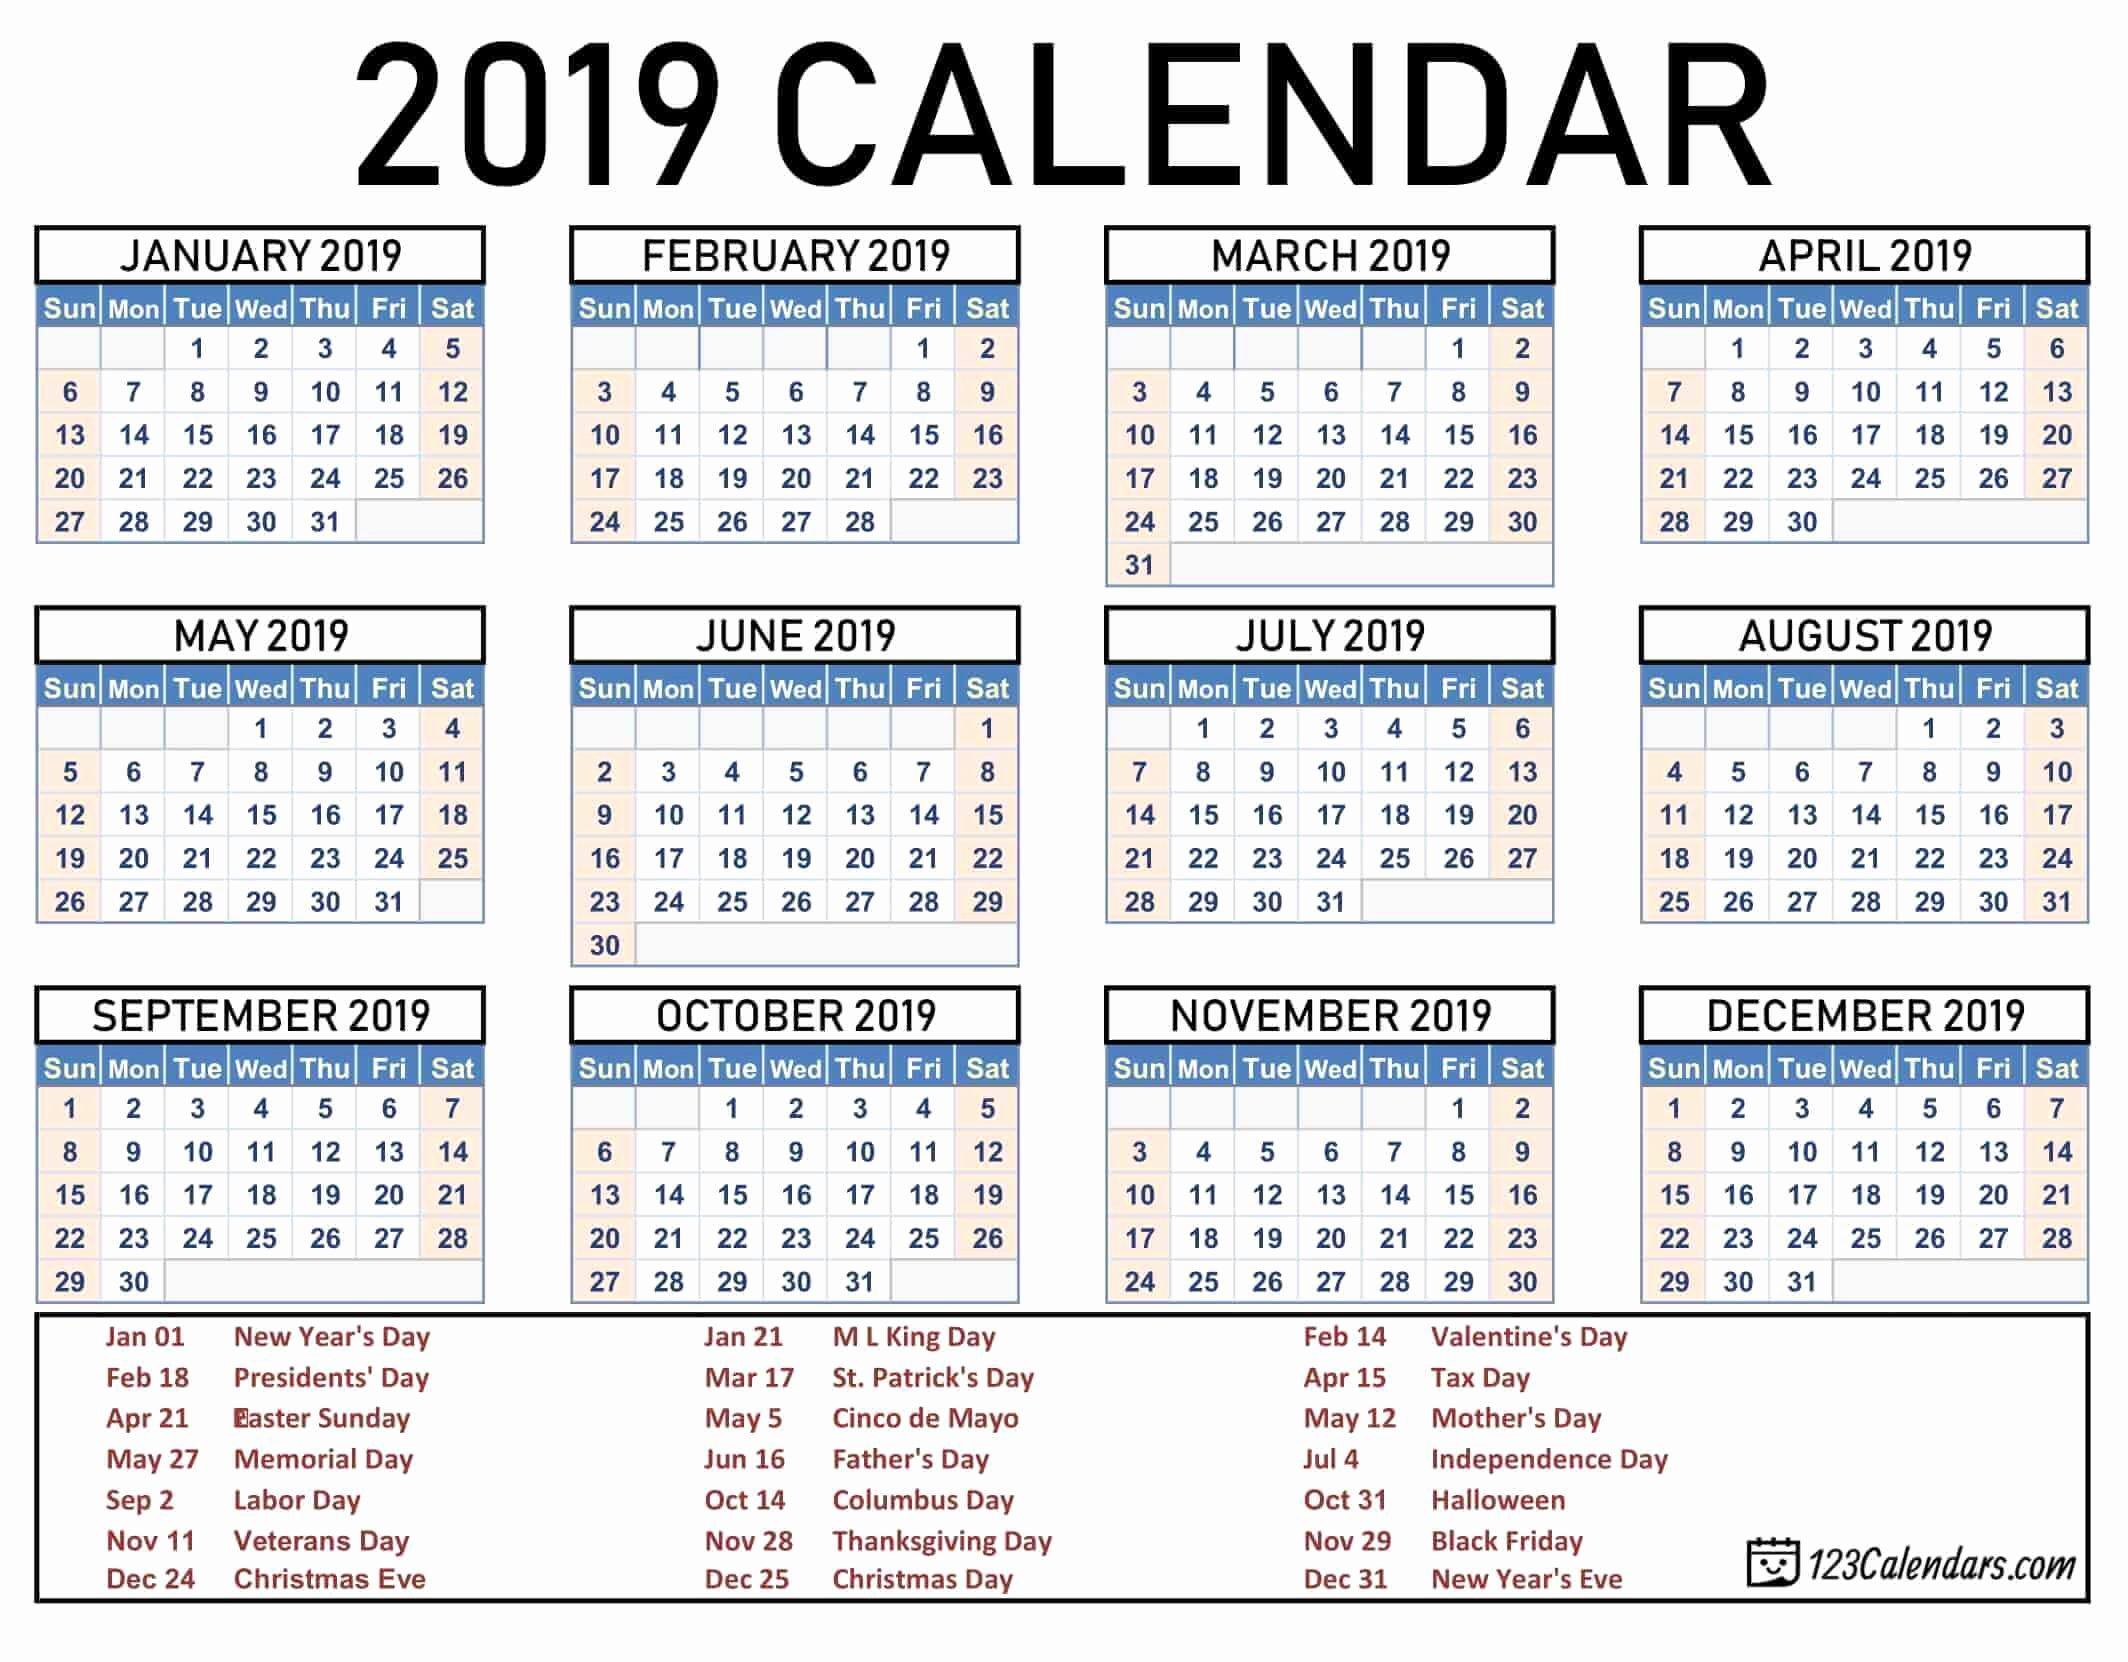 Free 2019 Calendar Template Inspirational Free Printable 2019 Calendar